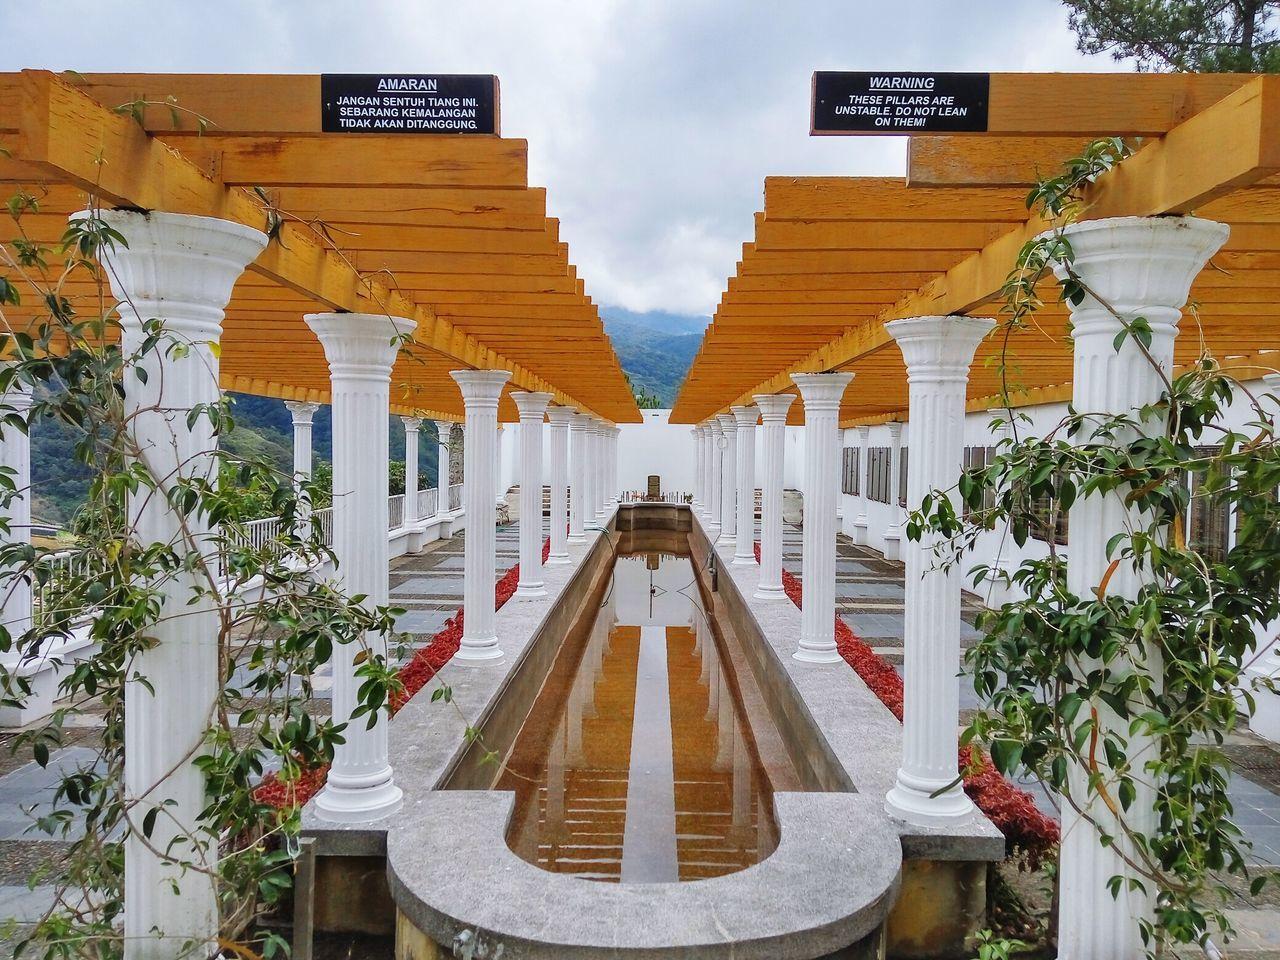 The War Memorial Park Kundasangview Outdoors Nature Landscape Cold Temperature Short Vacation Tourist Attraction